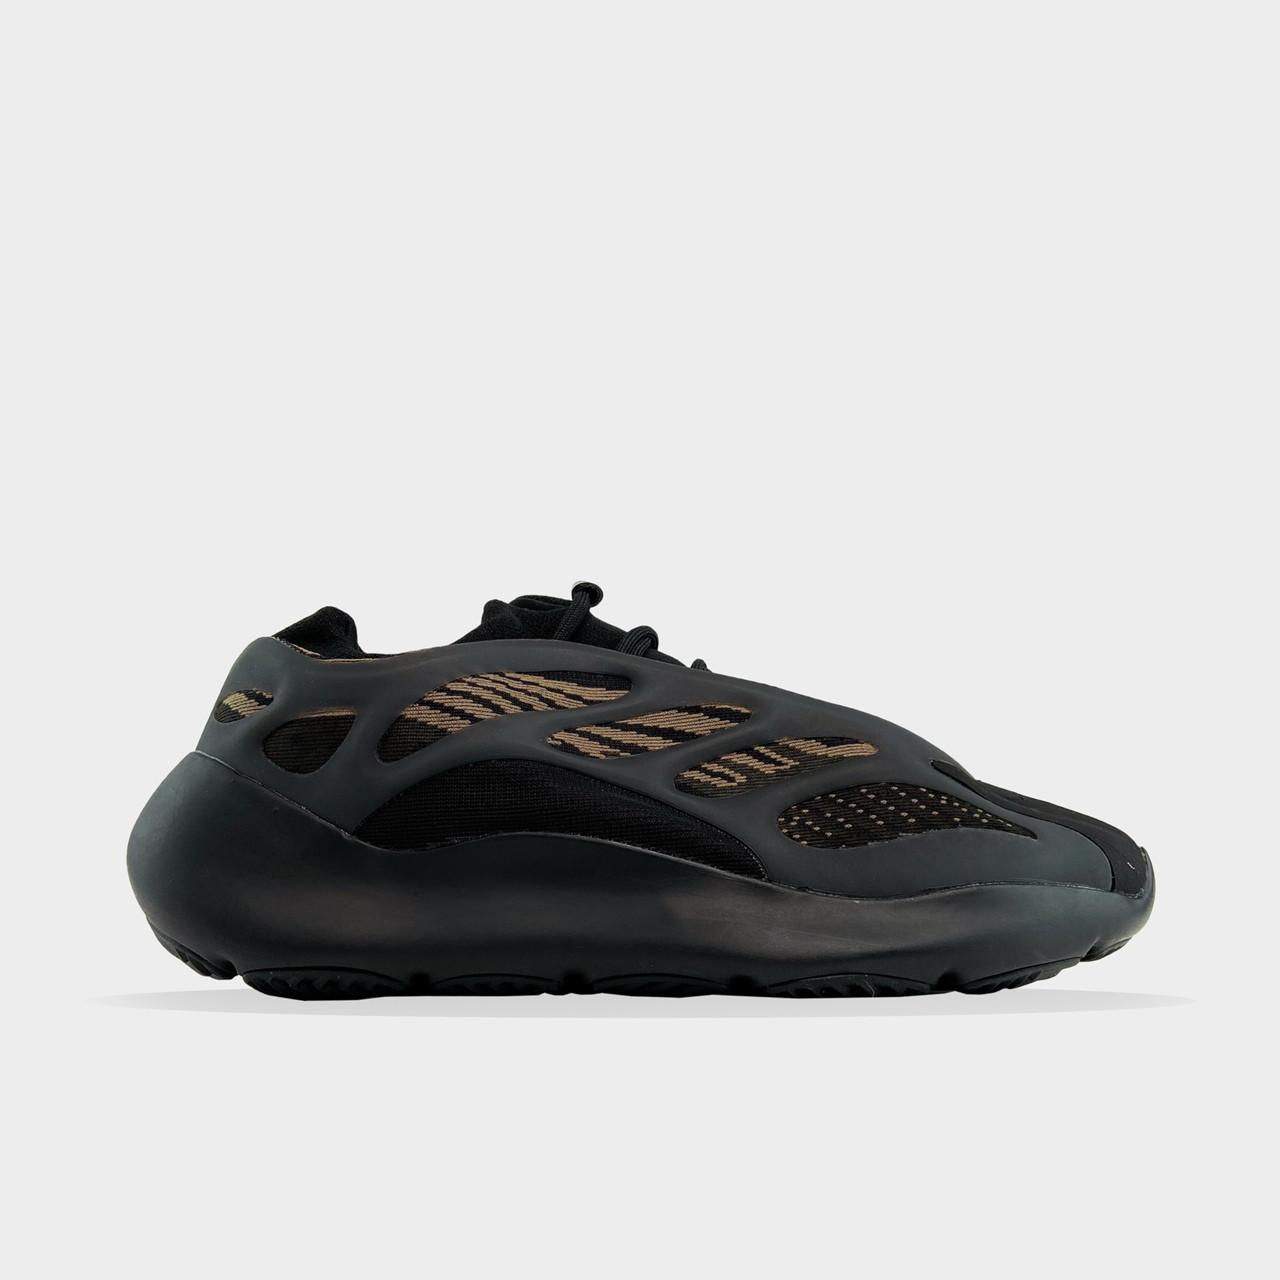 Мужские кроссовки Adidas Yeezy Boost 700 V3 Black Brown